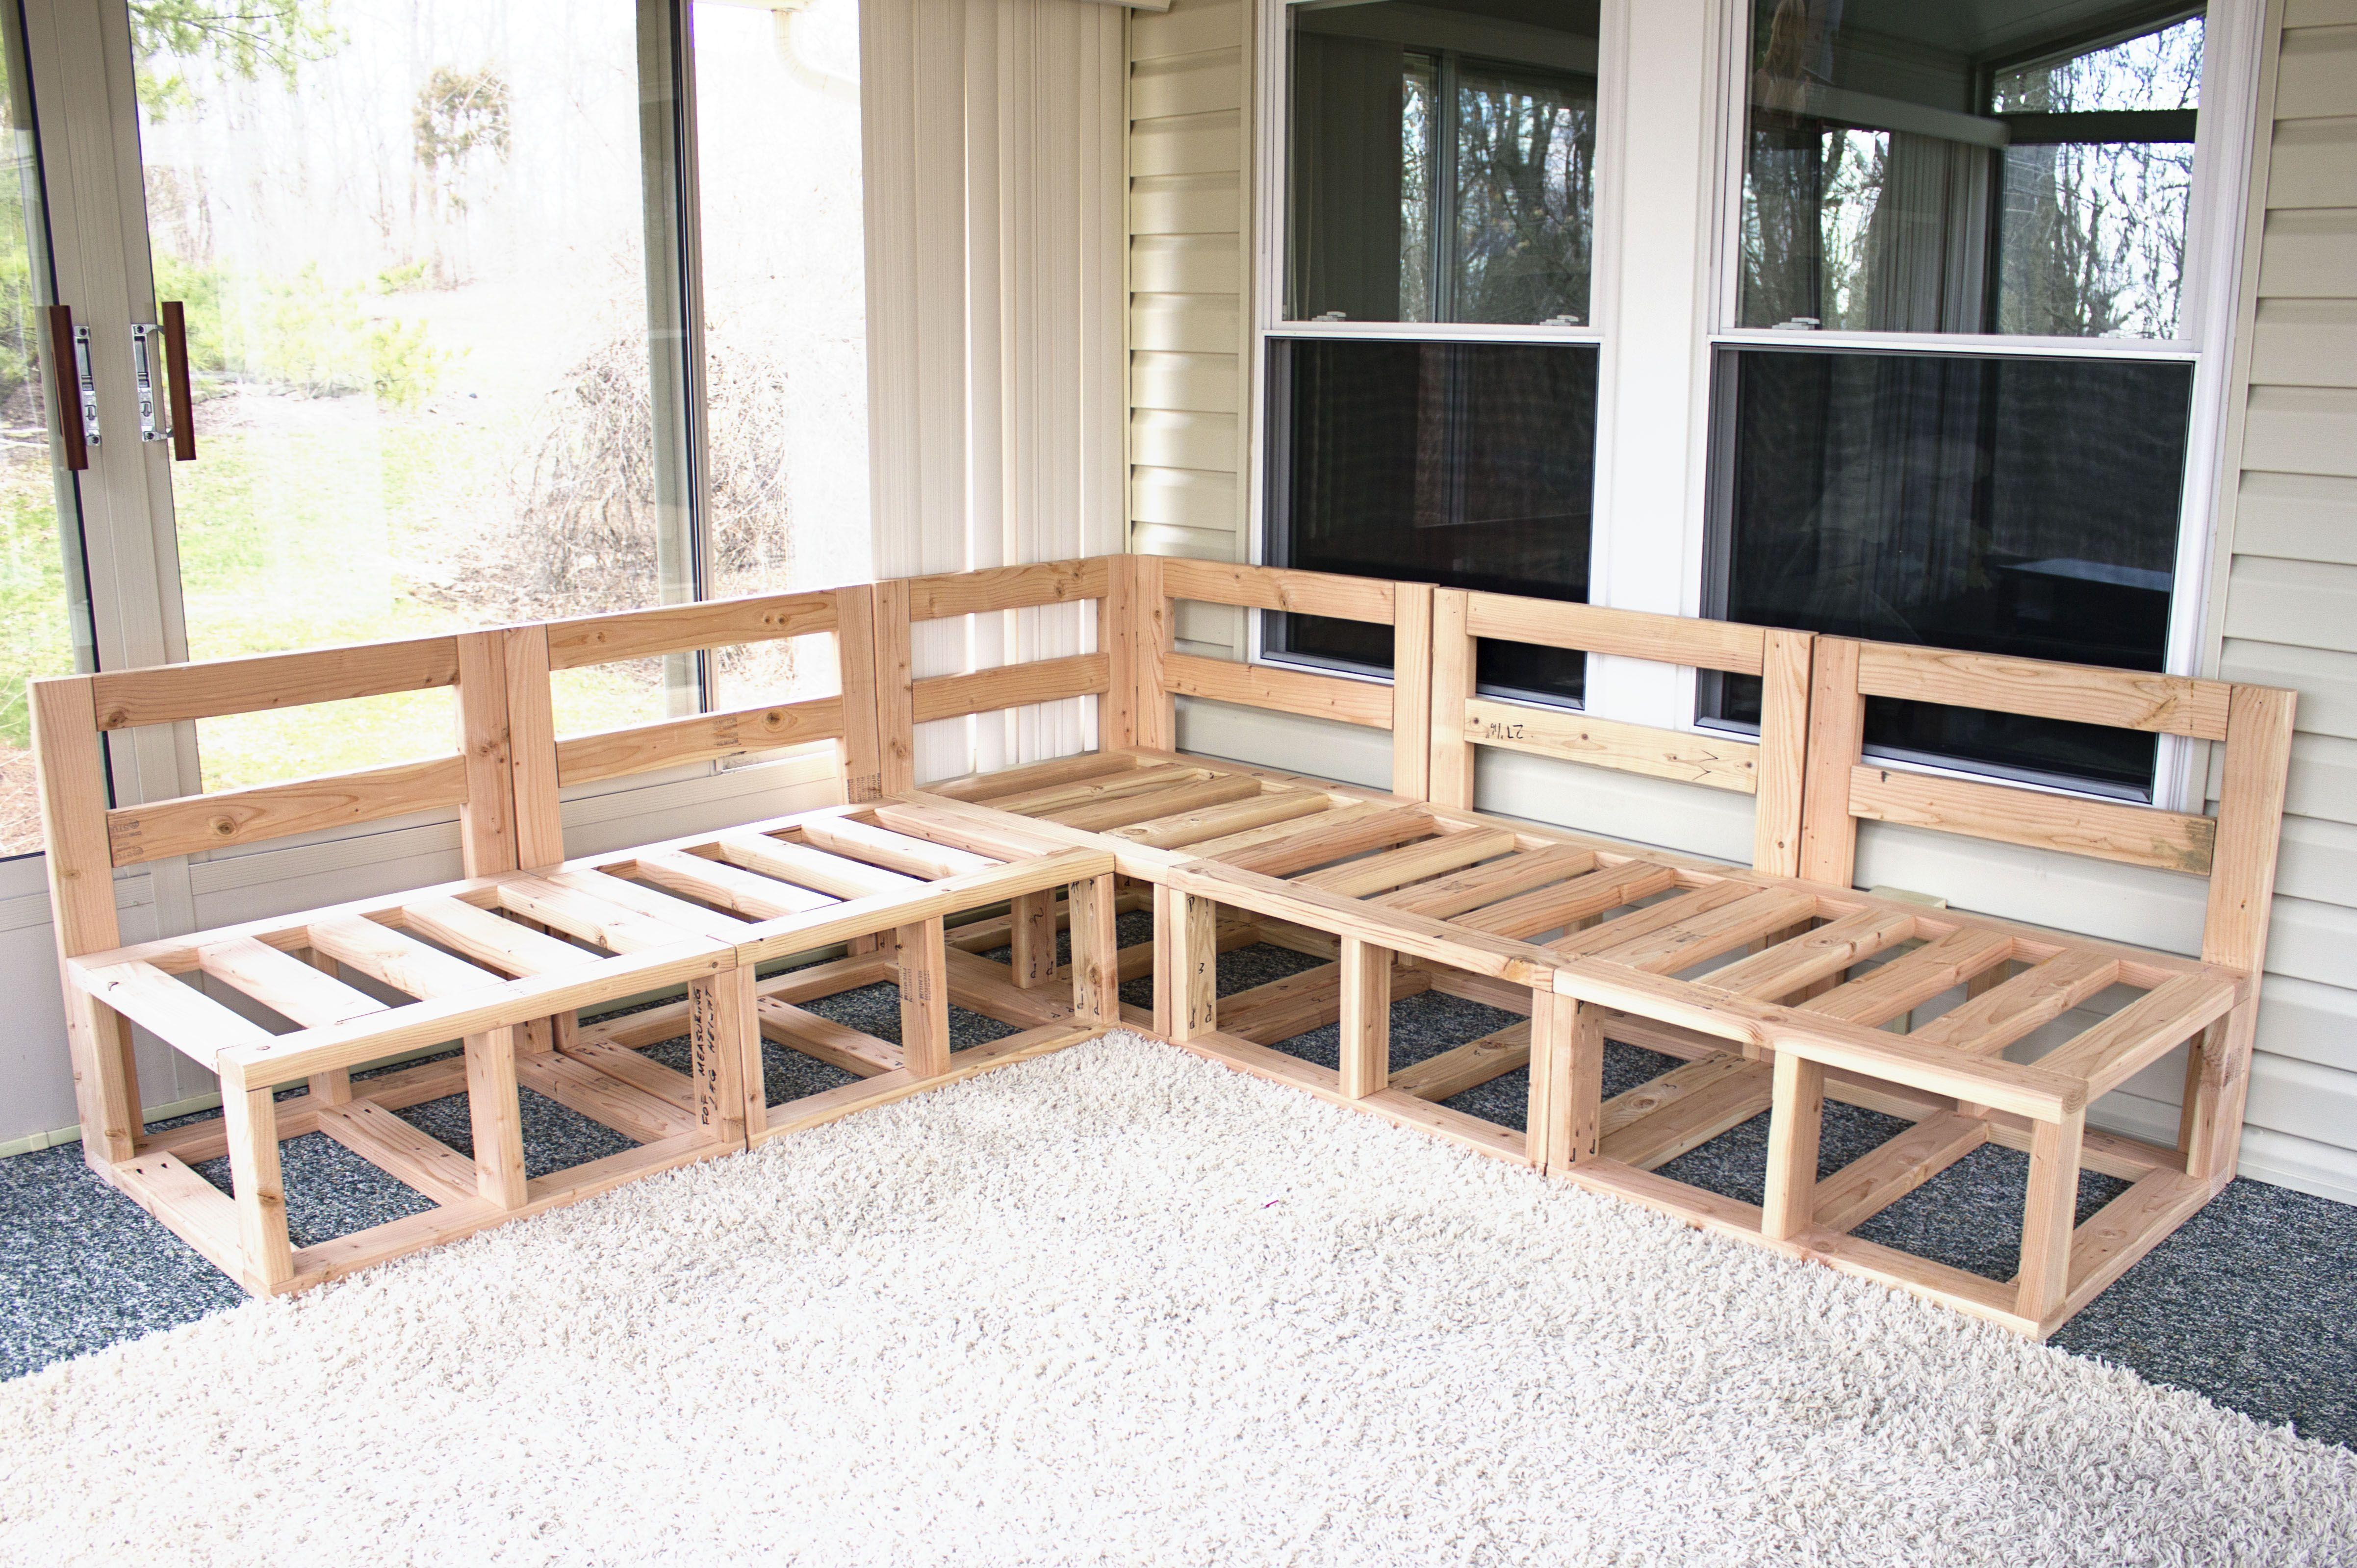 Outdoor Sectional furniture Pinterest Diy outdoor furniture